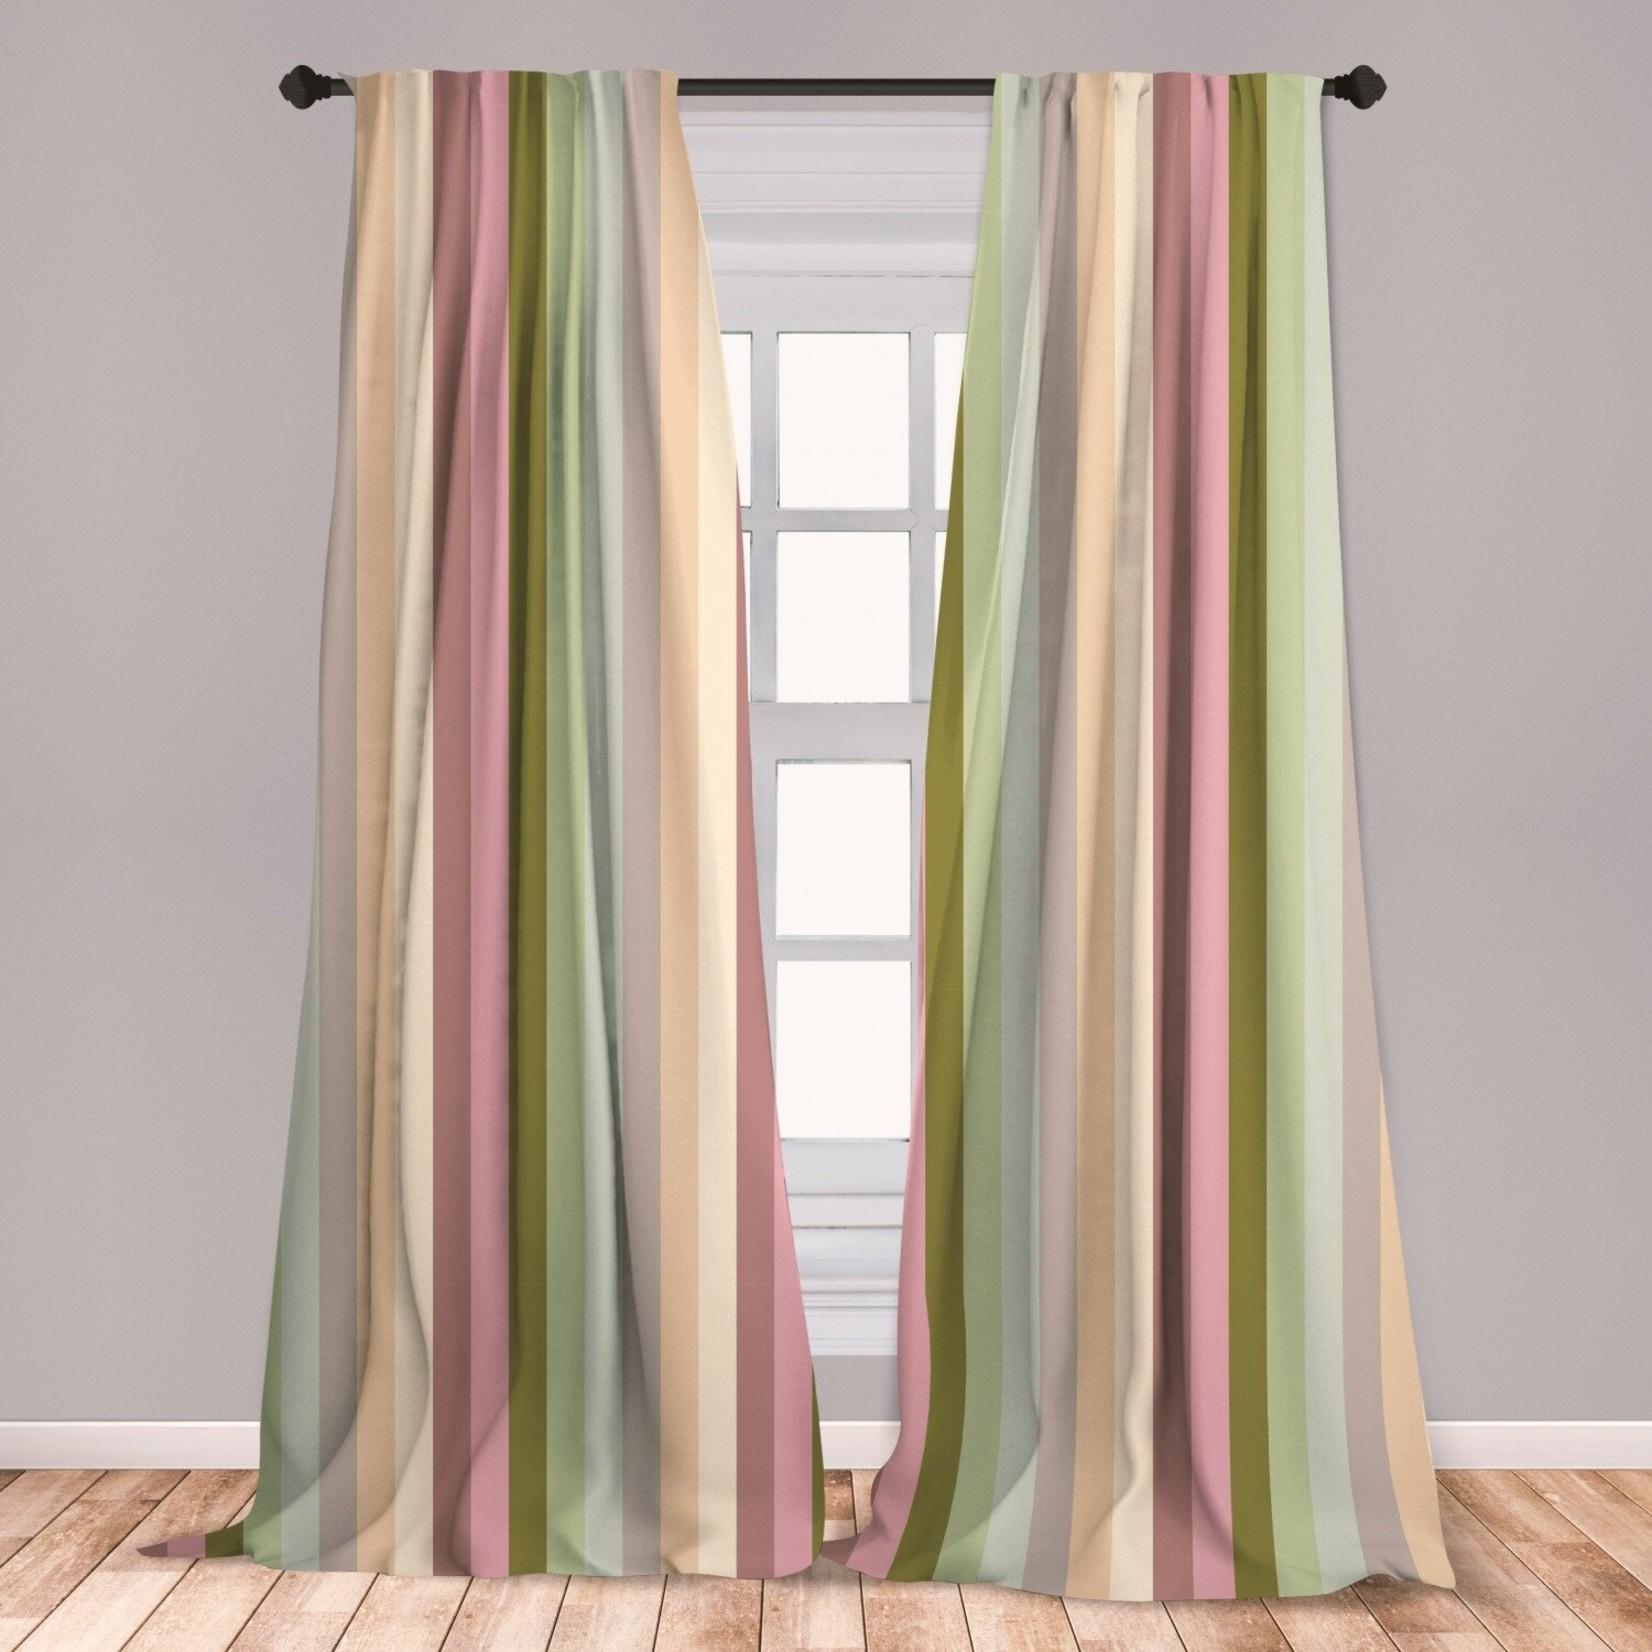 "*28"" x 63"" - Stripes Room Darkening Rod Pocket Curtain Panels"